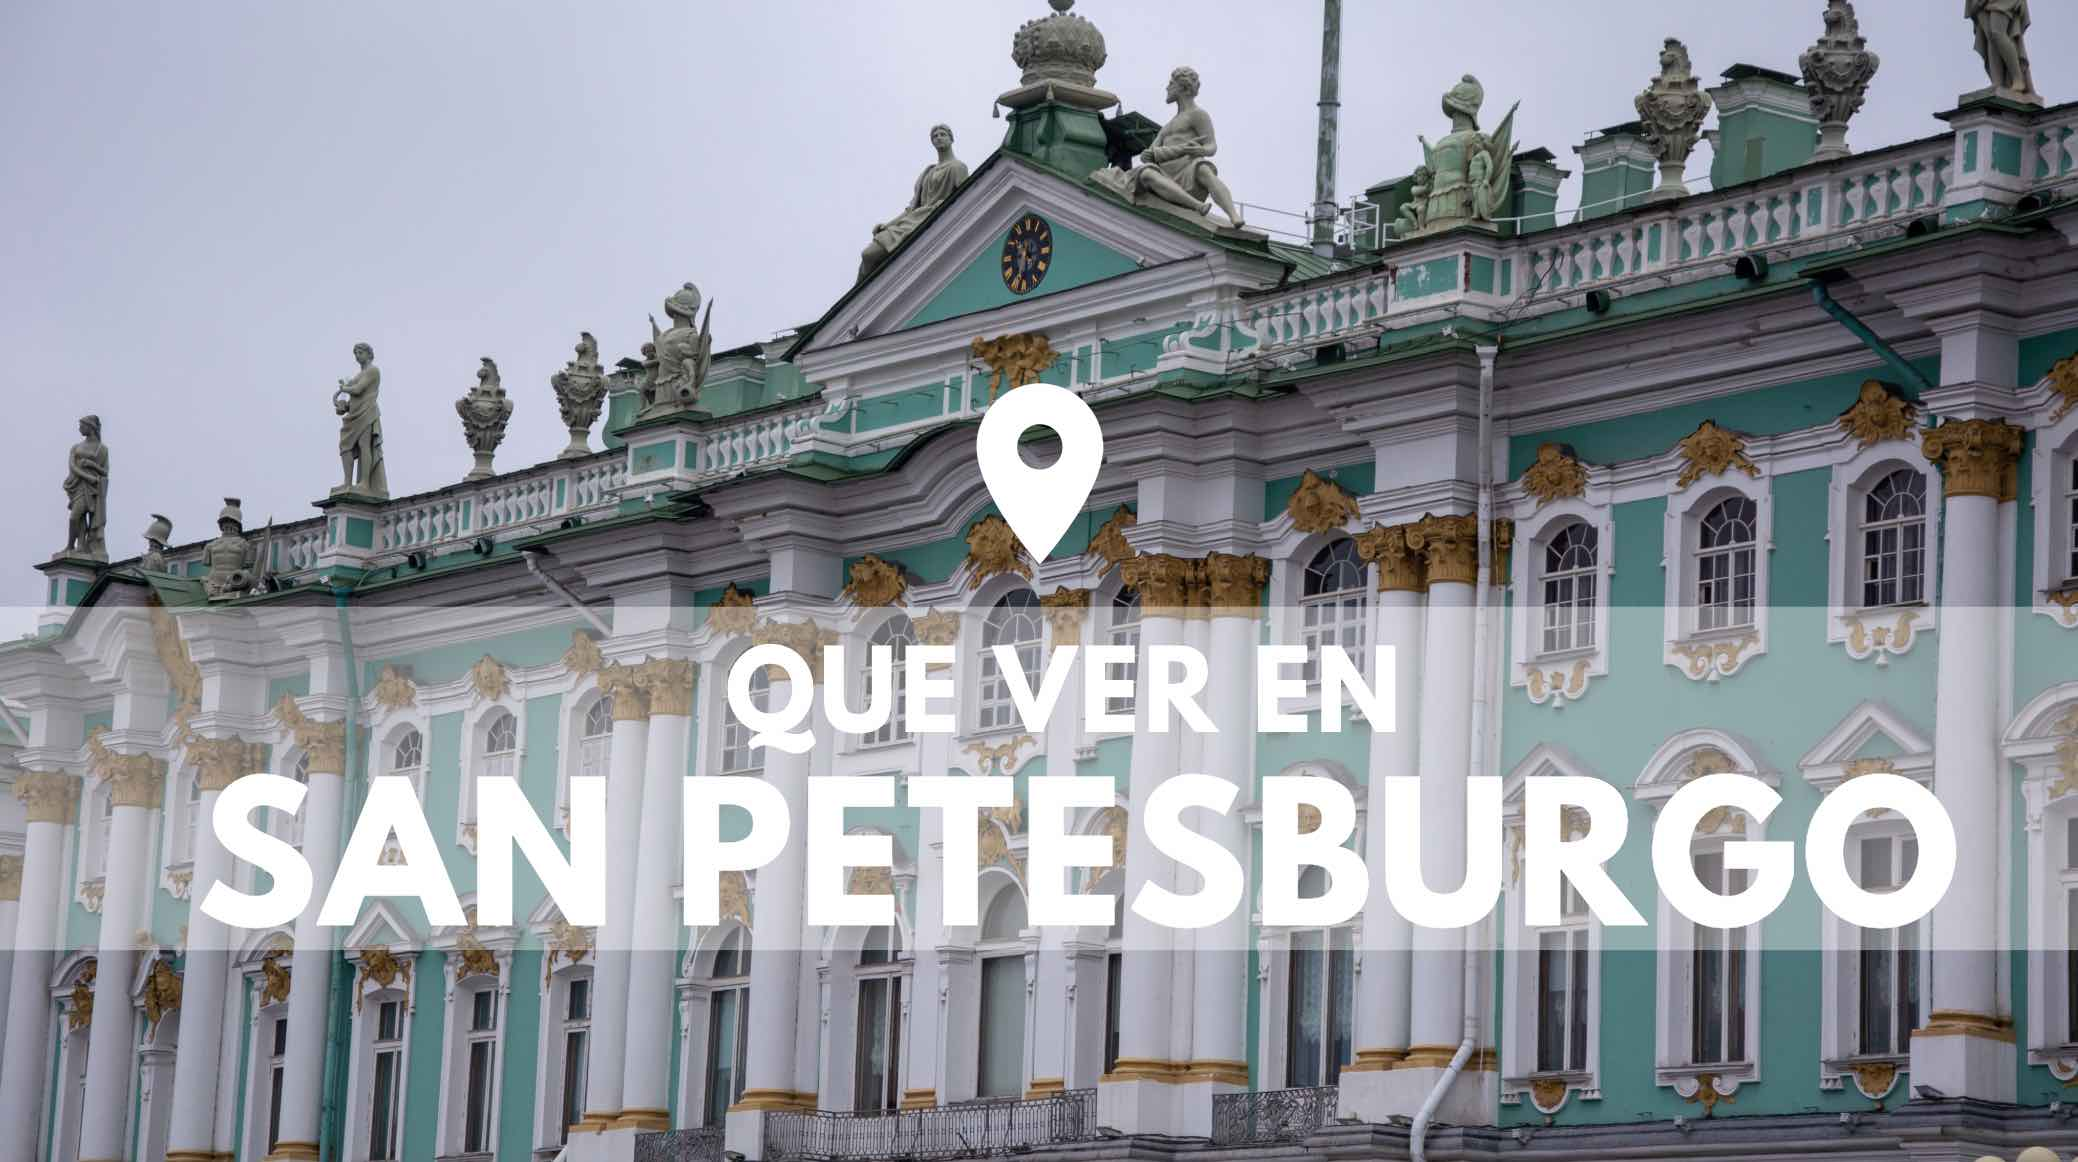 Que ver en San Petesburgo